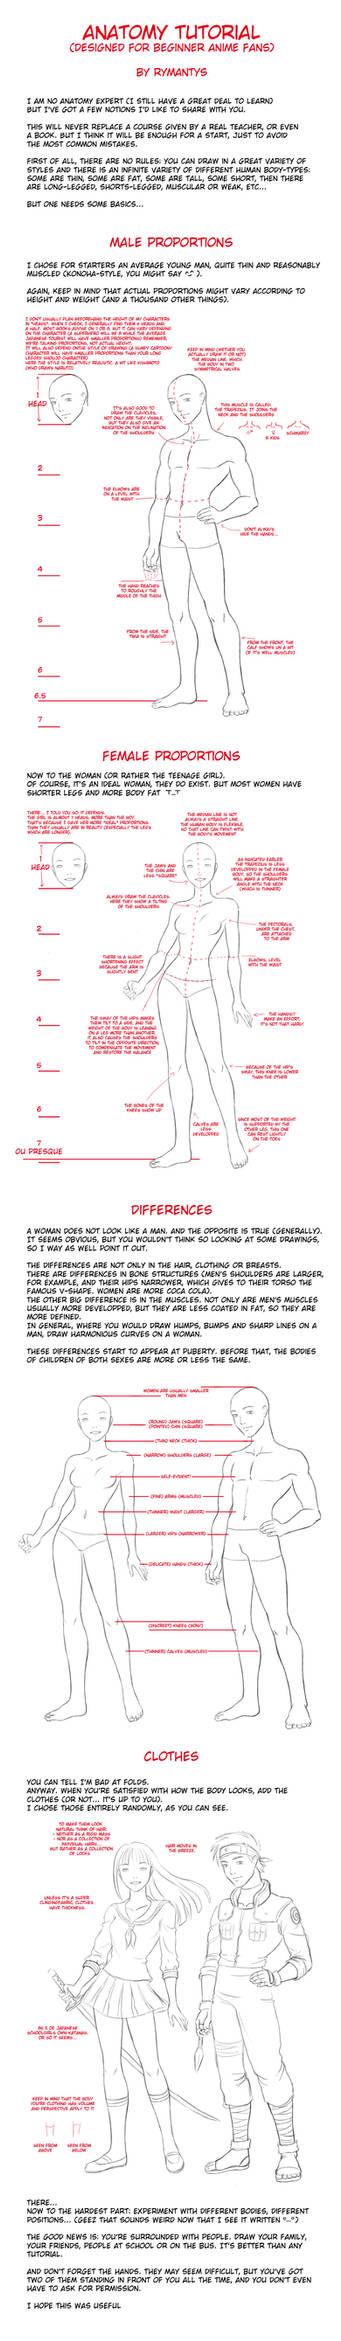 Anatomy tutorial for beginners